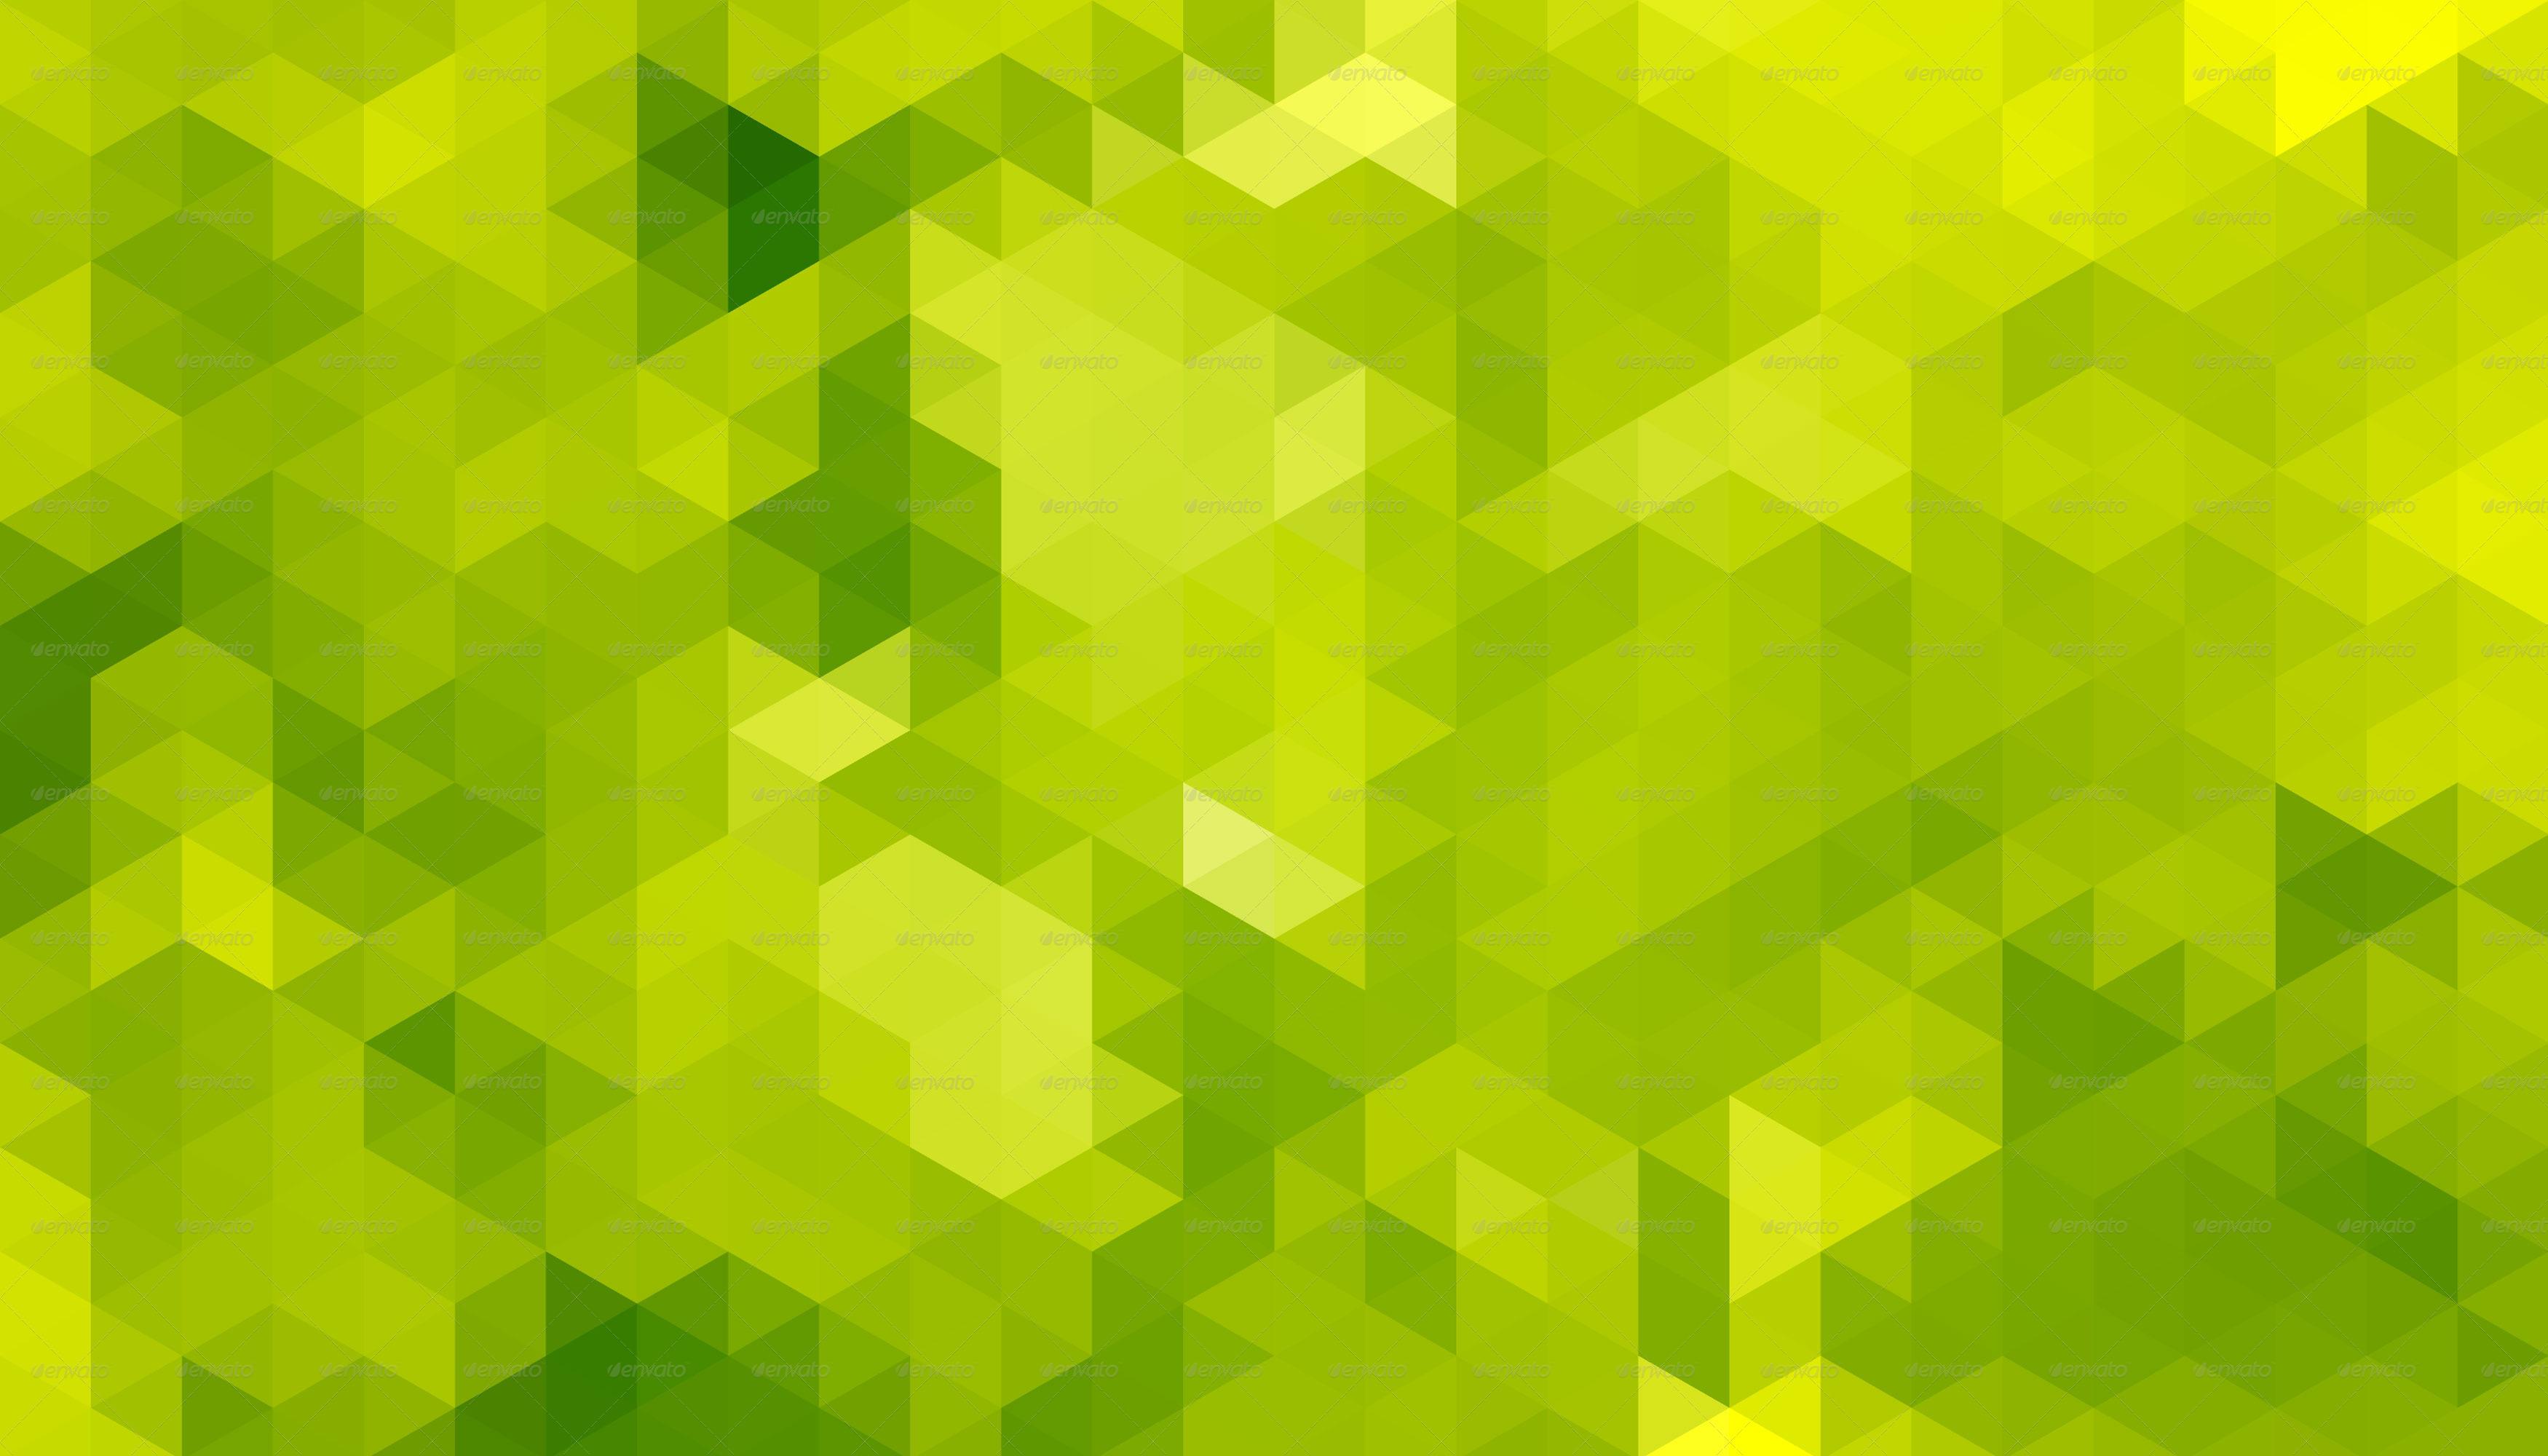 Image Result For Home Design Decorative Wallpaper Wallpaper